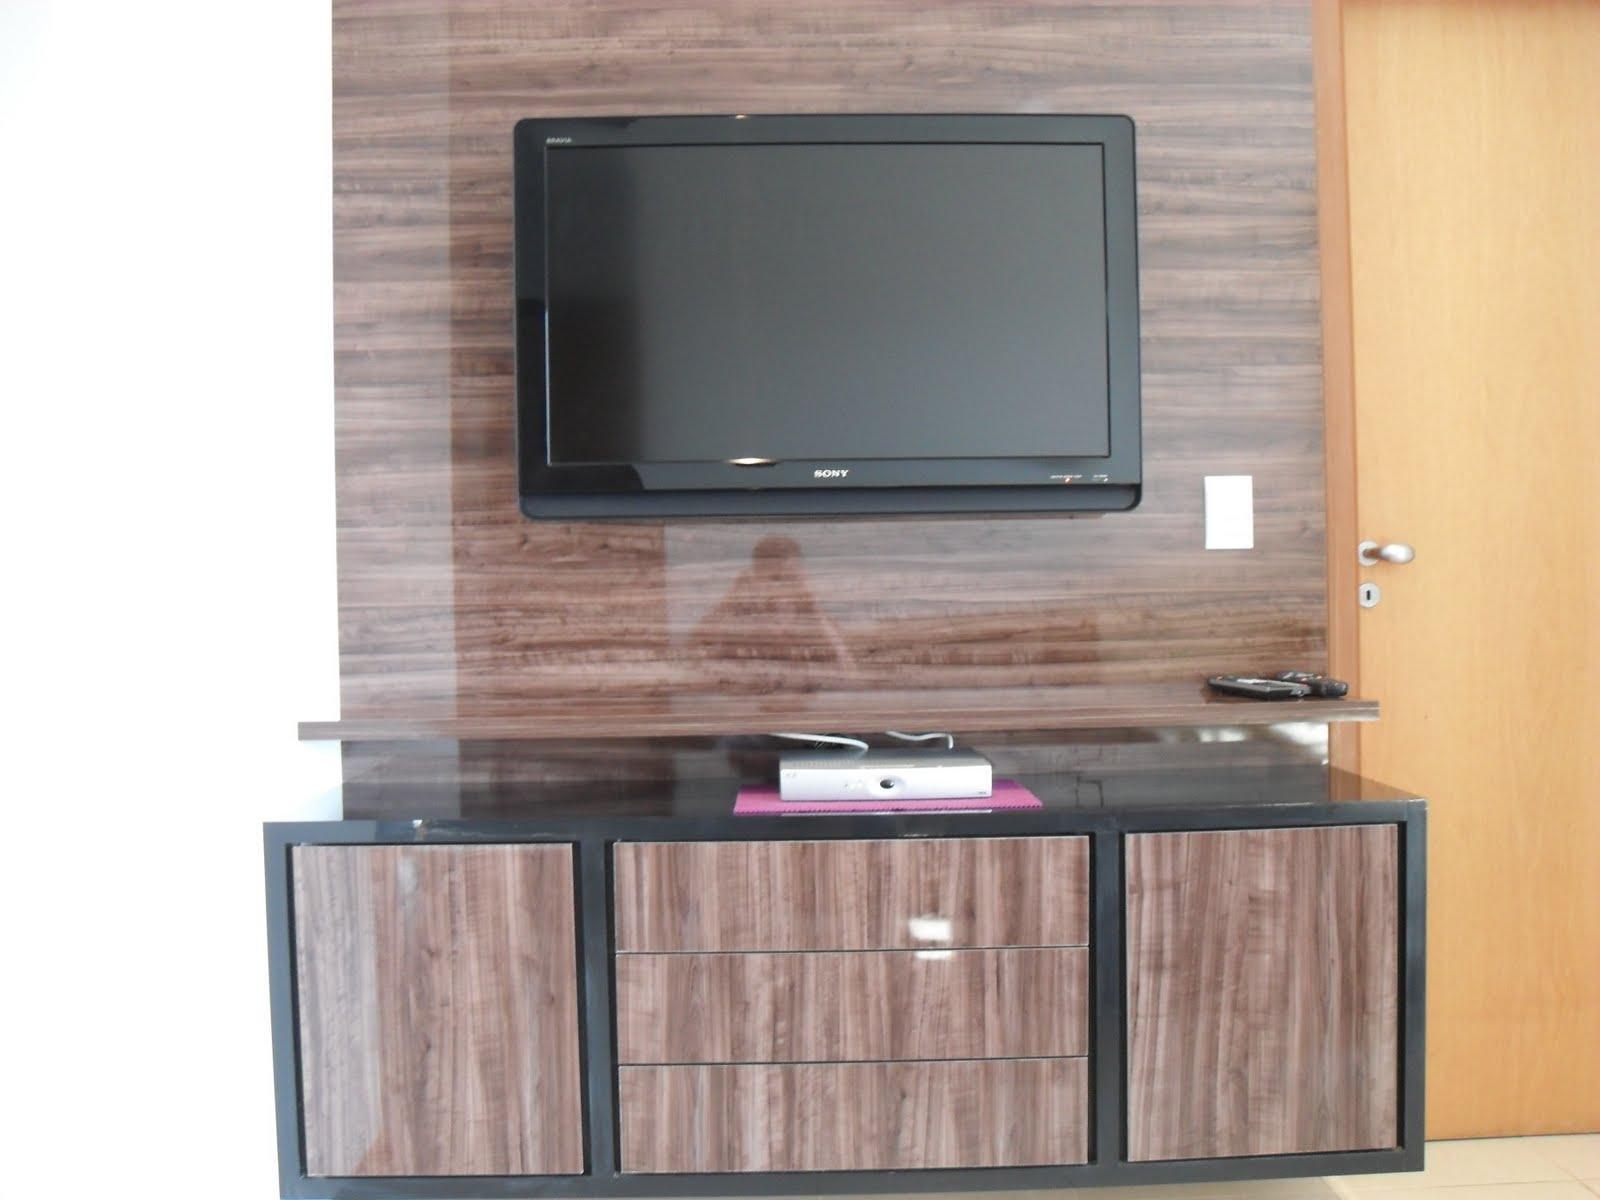 marcenaria e designer morozesk: Painel para TV LCD #A56E26 1600x1200